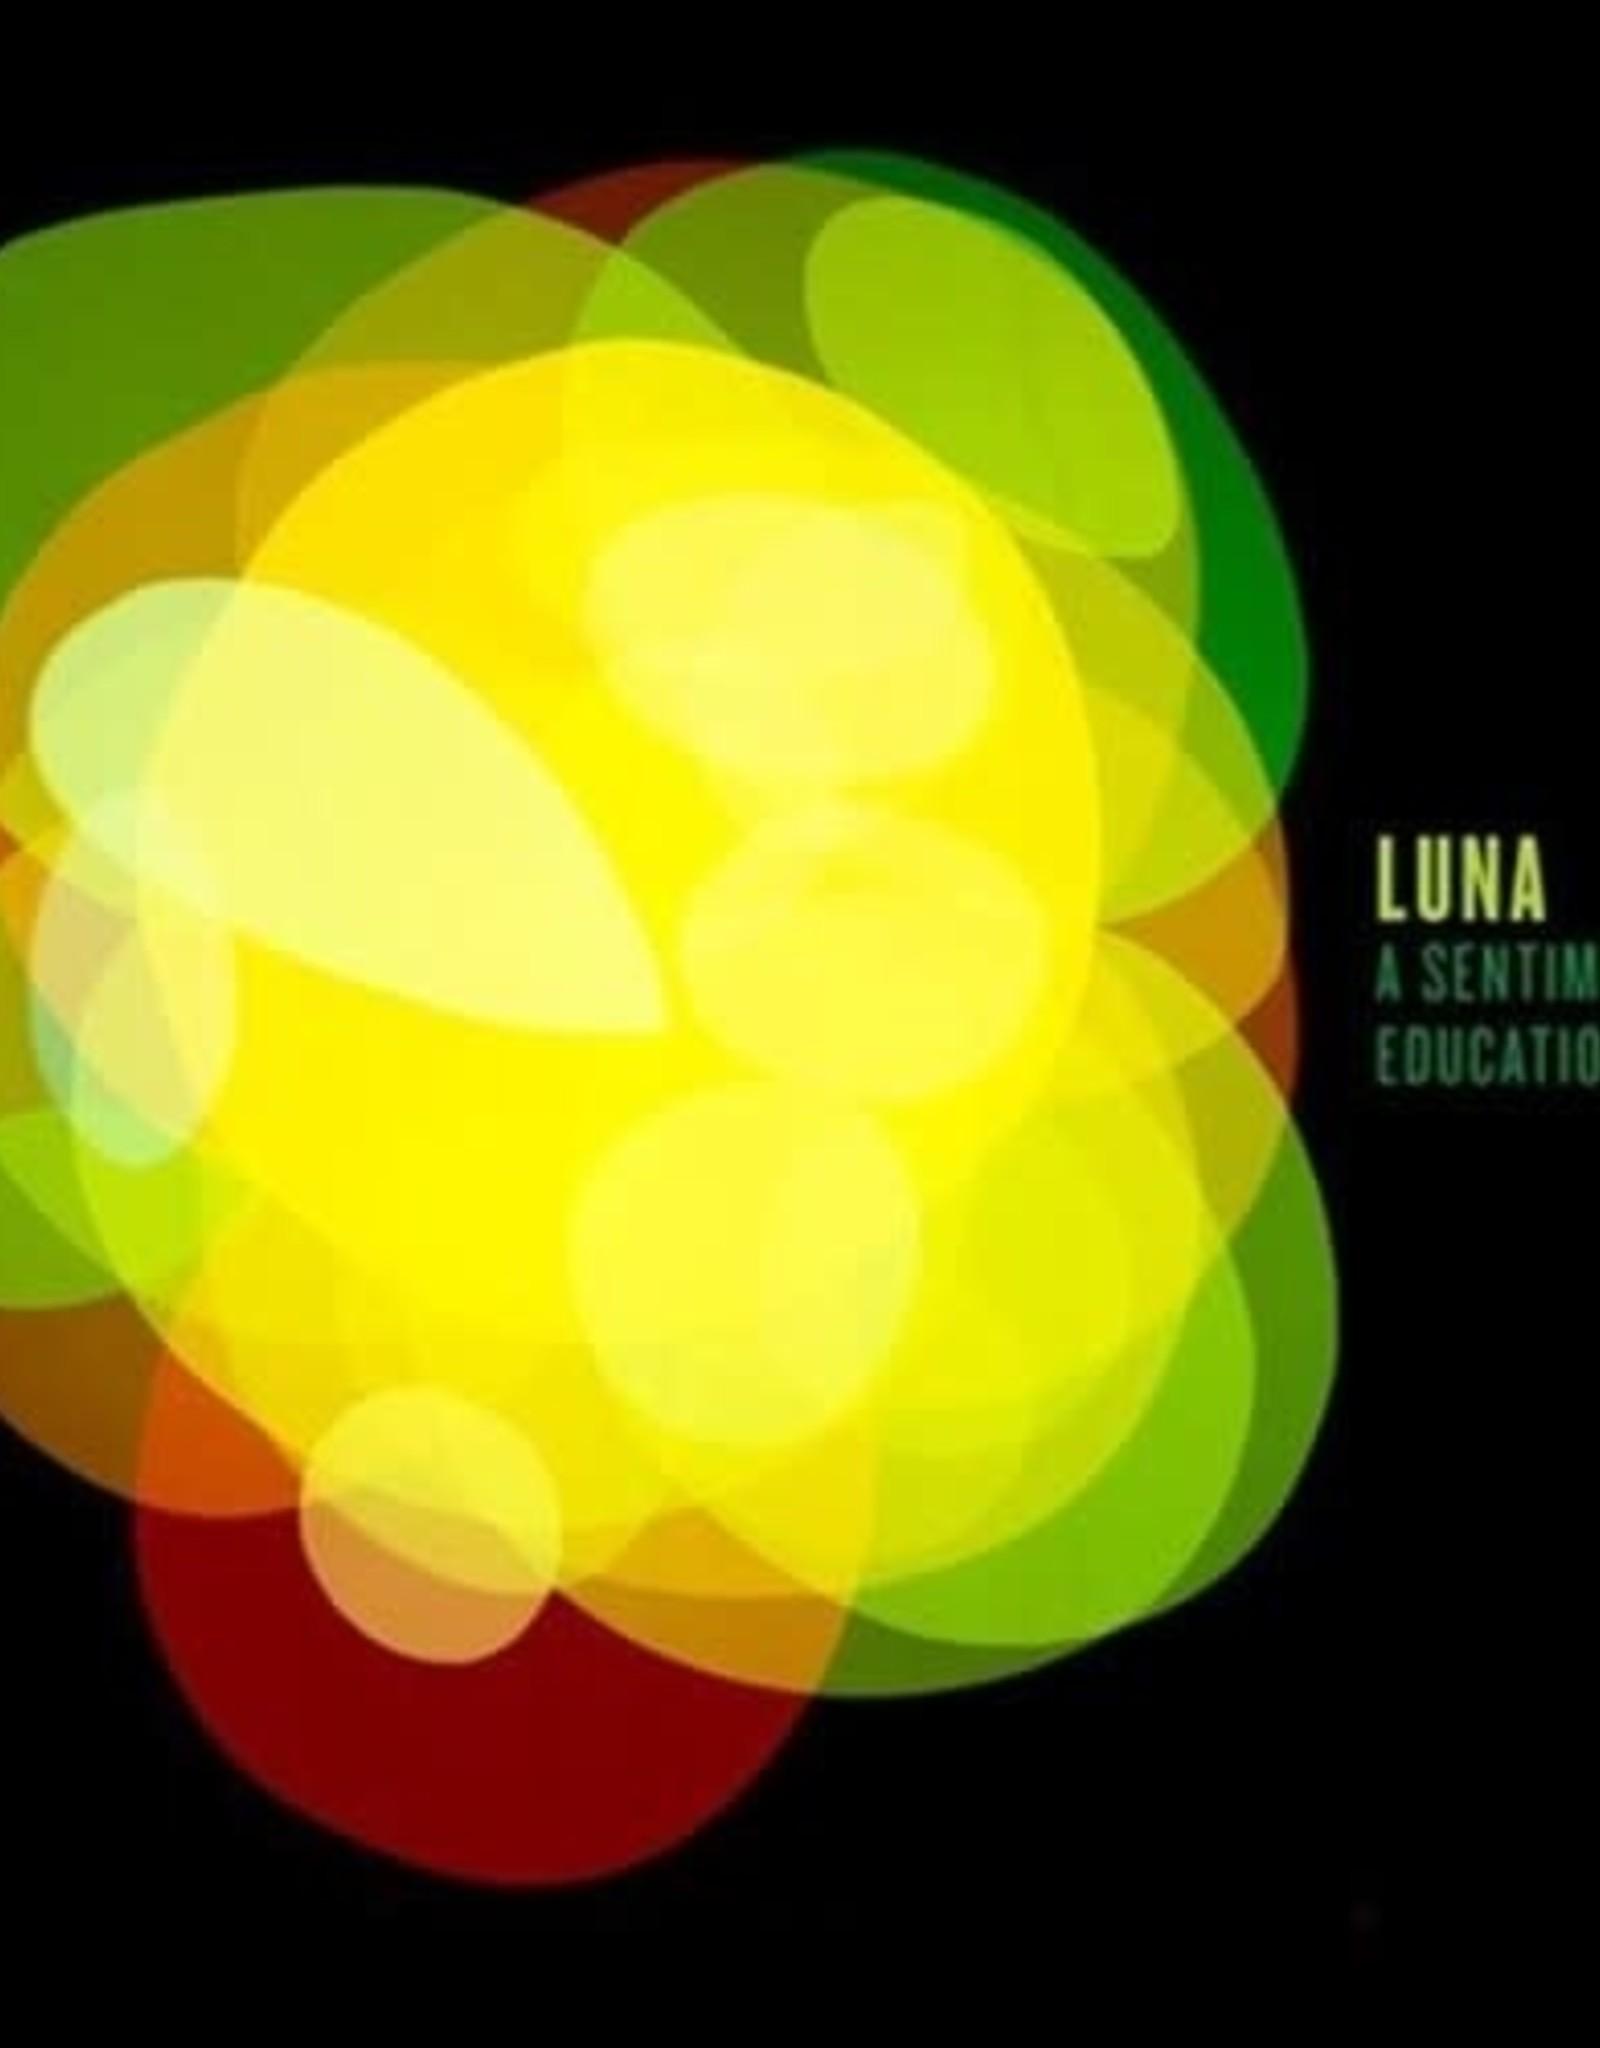 Luna - Sentimental Education